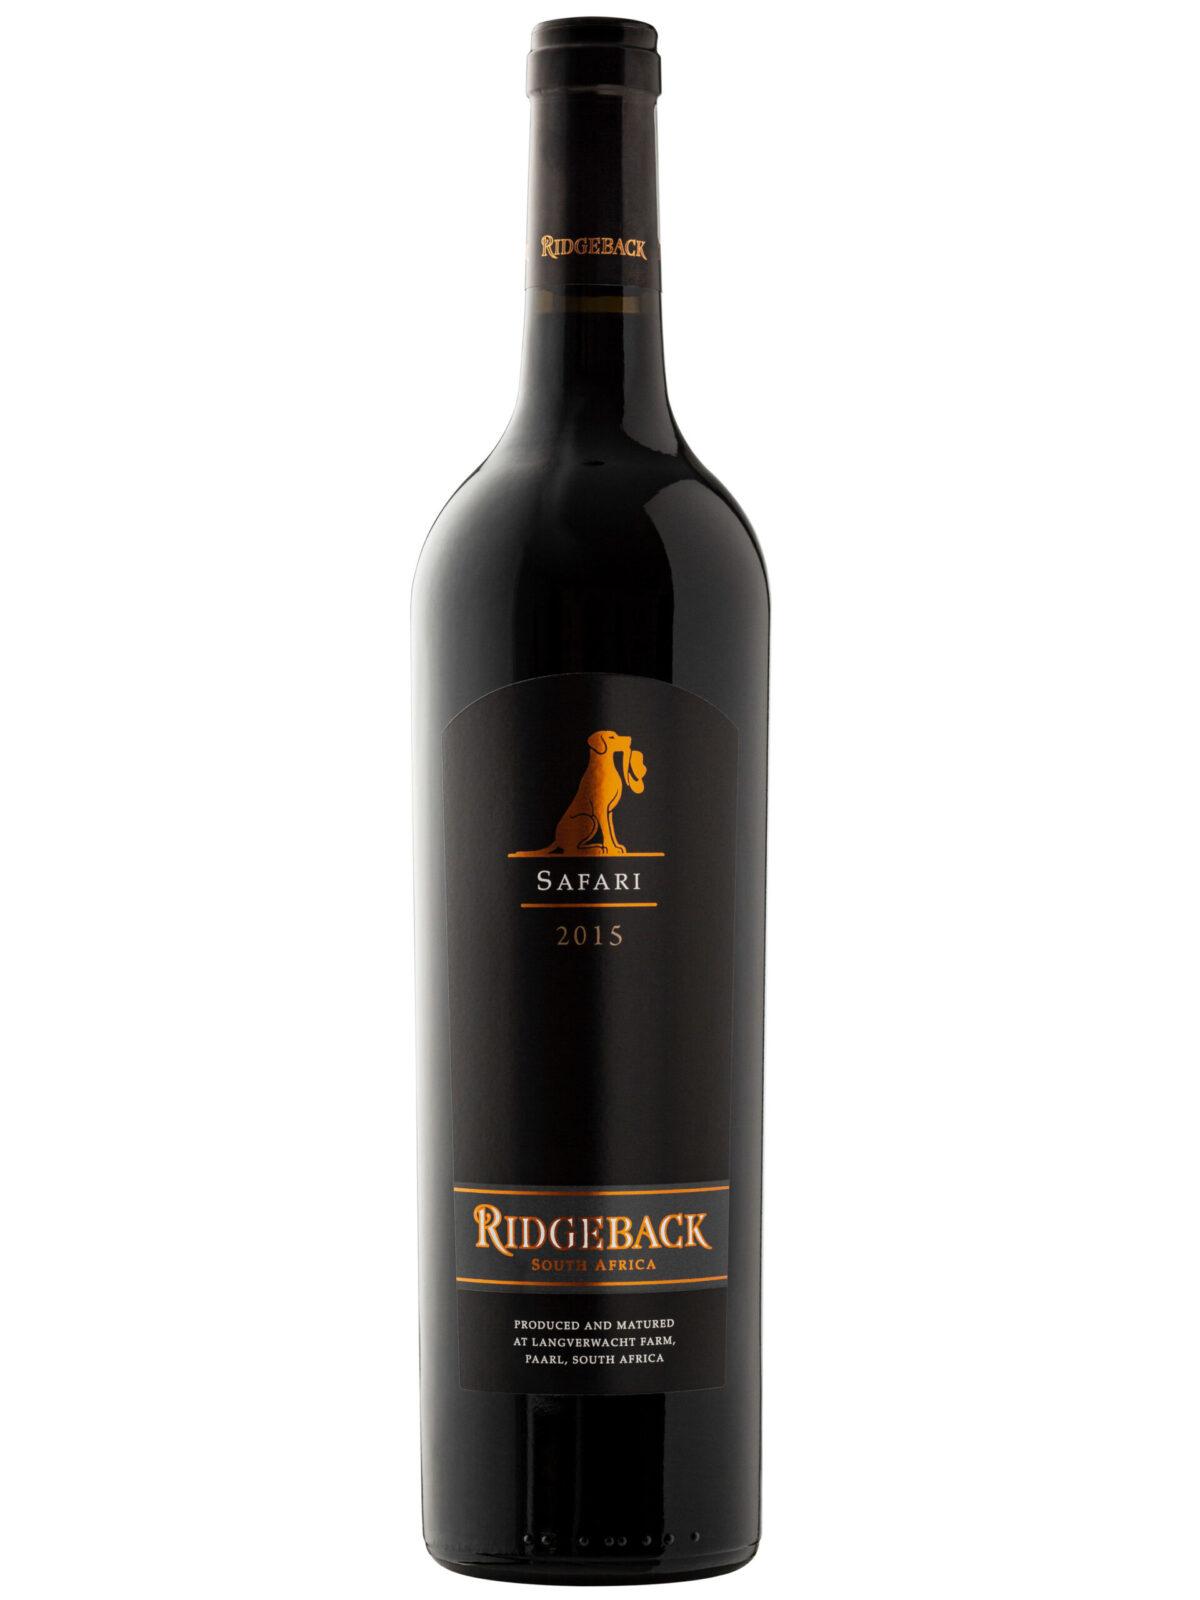 Ridgeback Safari Red Blend wine bottle.